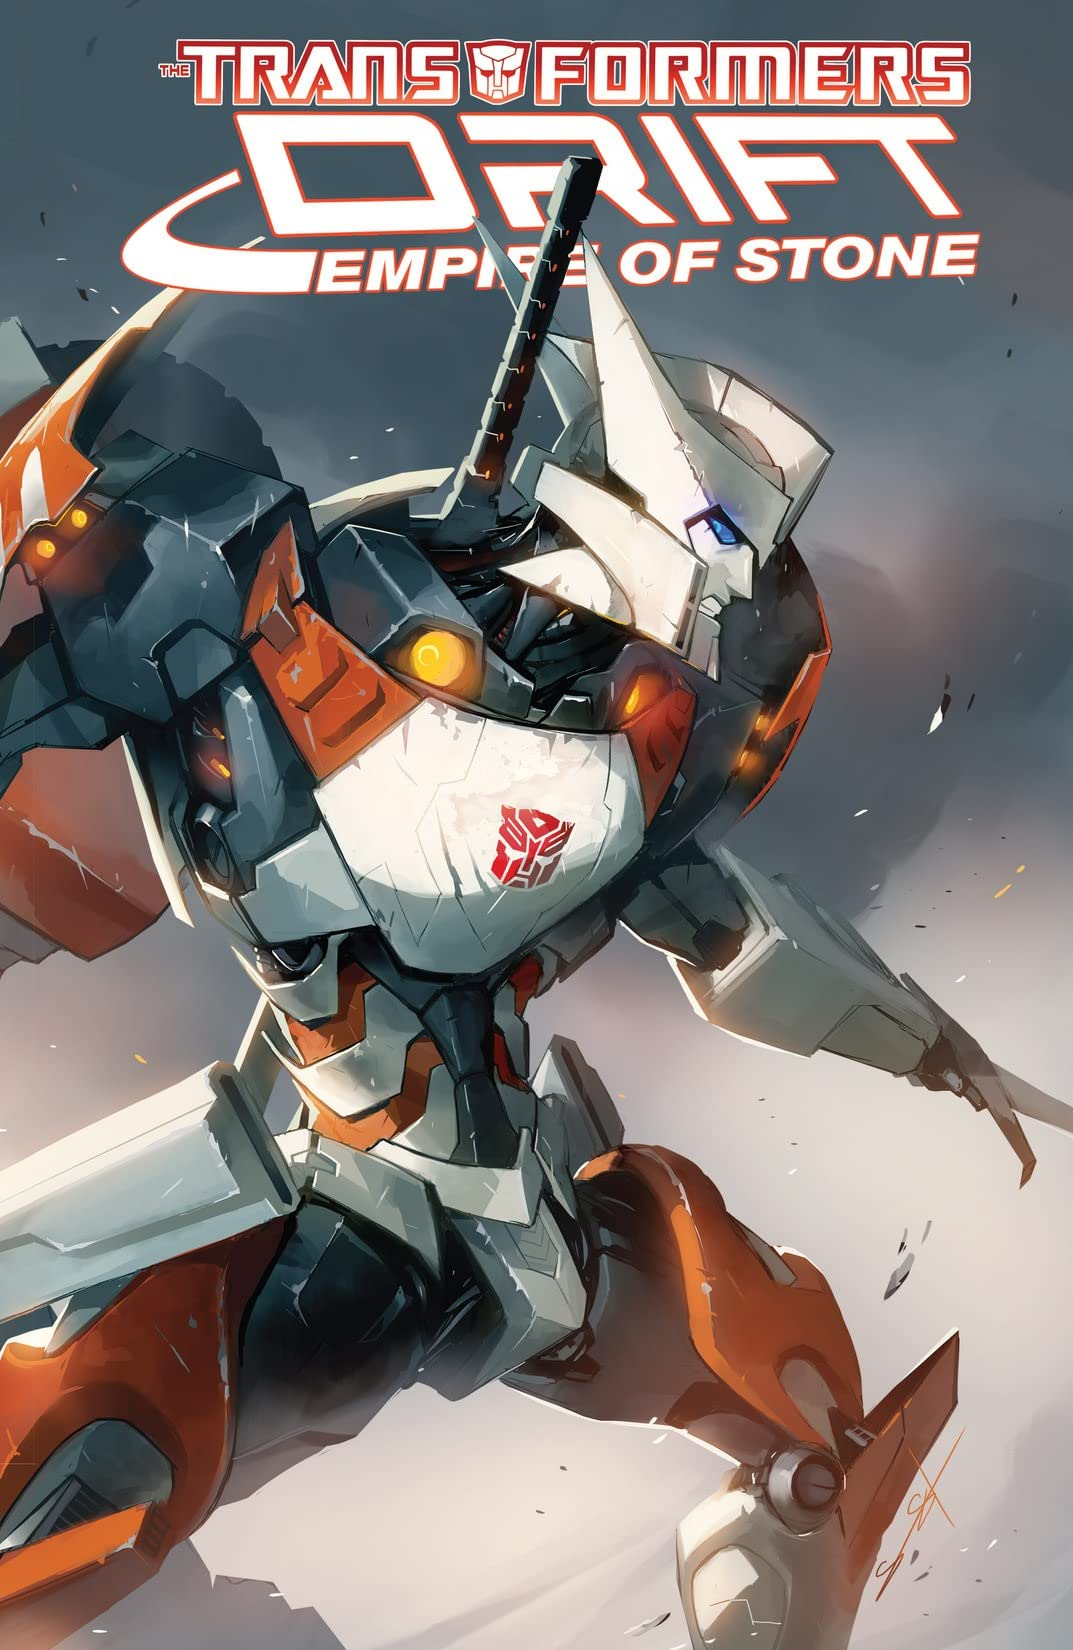 transformers drift empire of stone comics by comixology